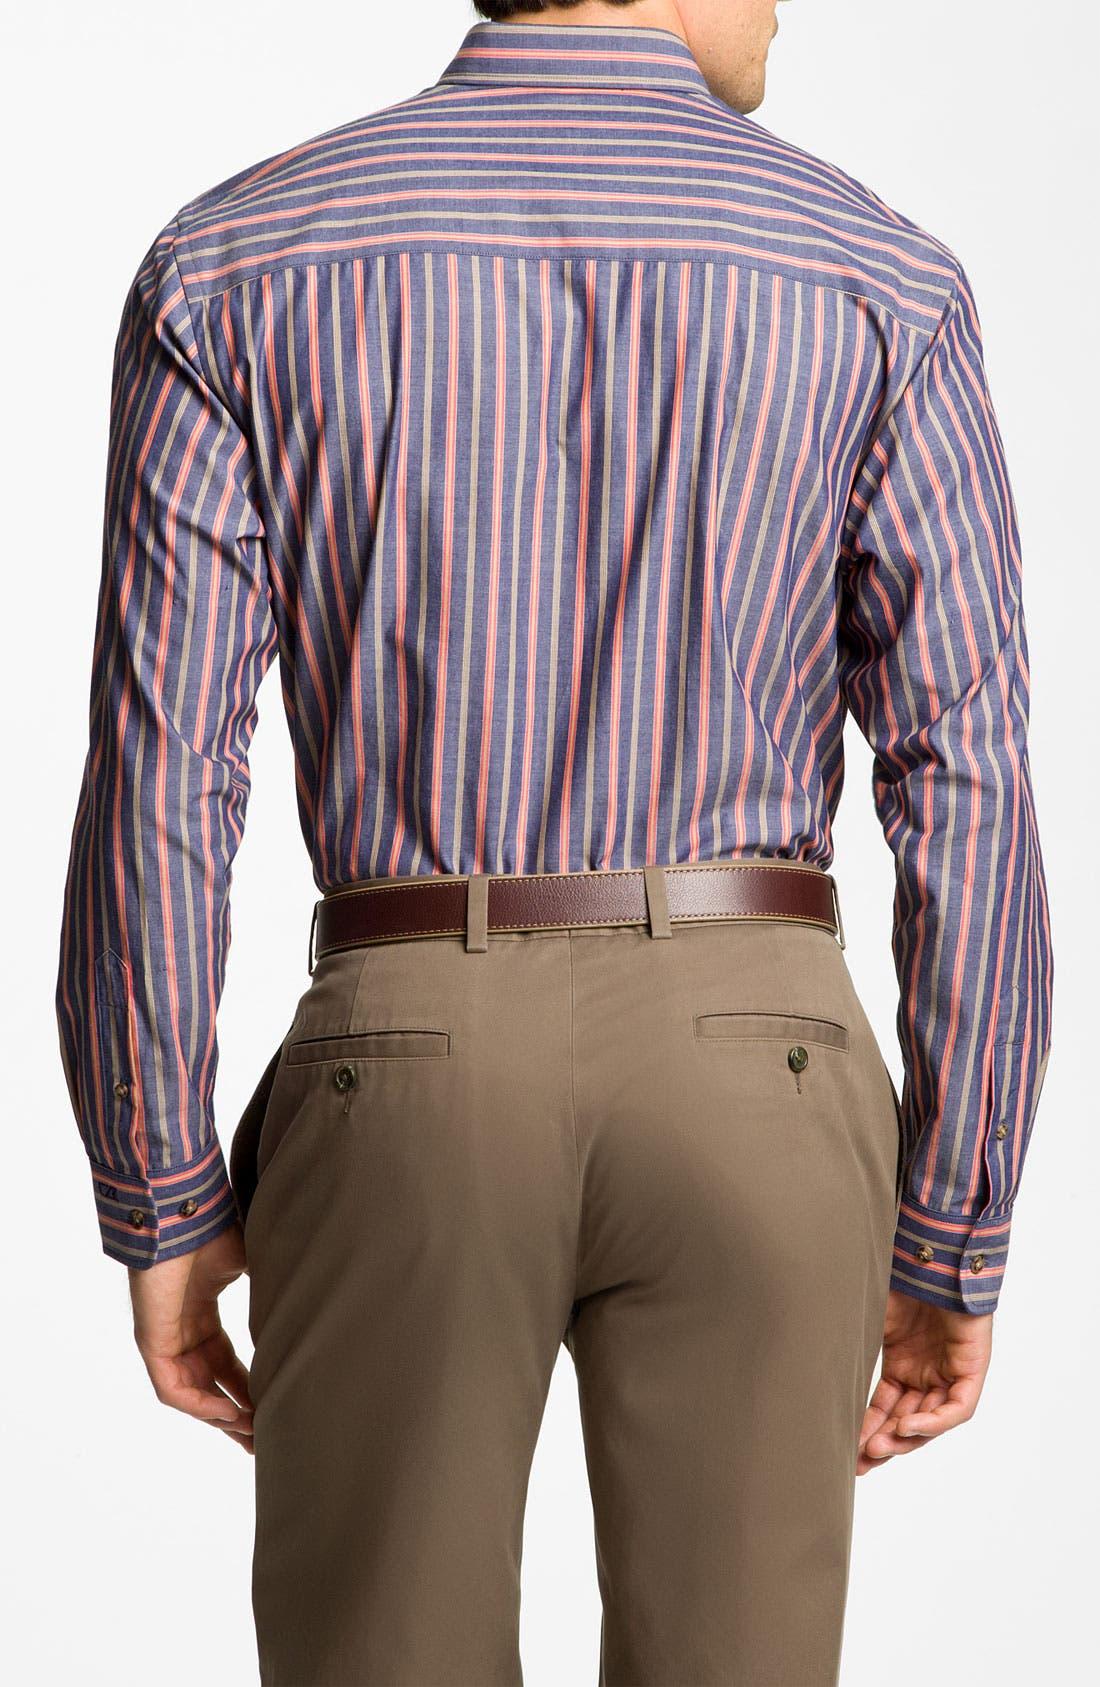 Alternate Image 2  - Cutter & Buck 'Harvest' Stripe Sport Shirt (Big & Tall) (Online Only)